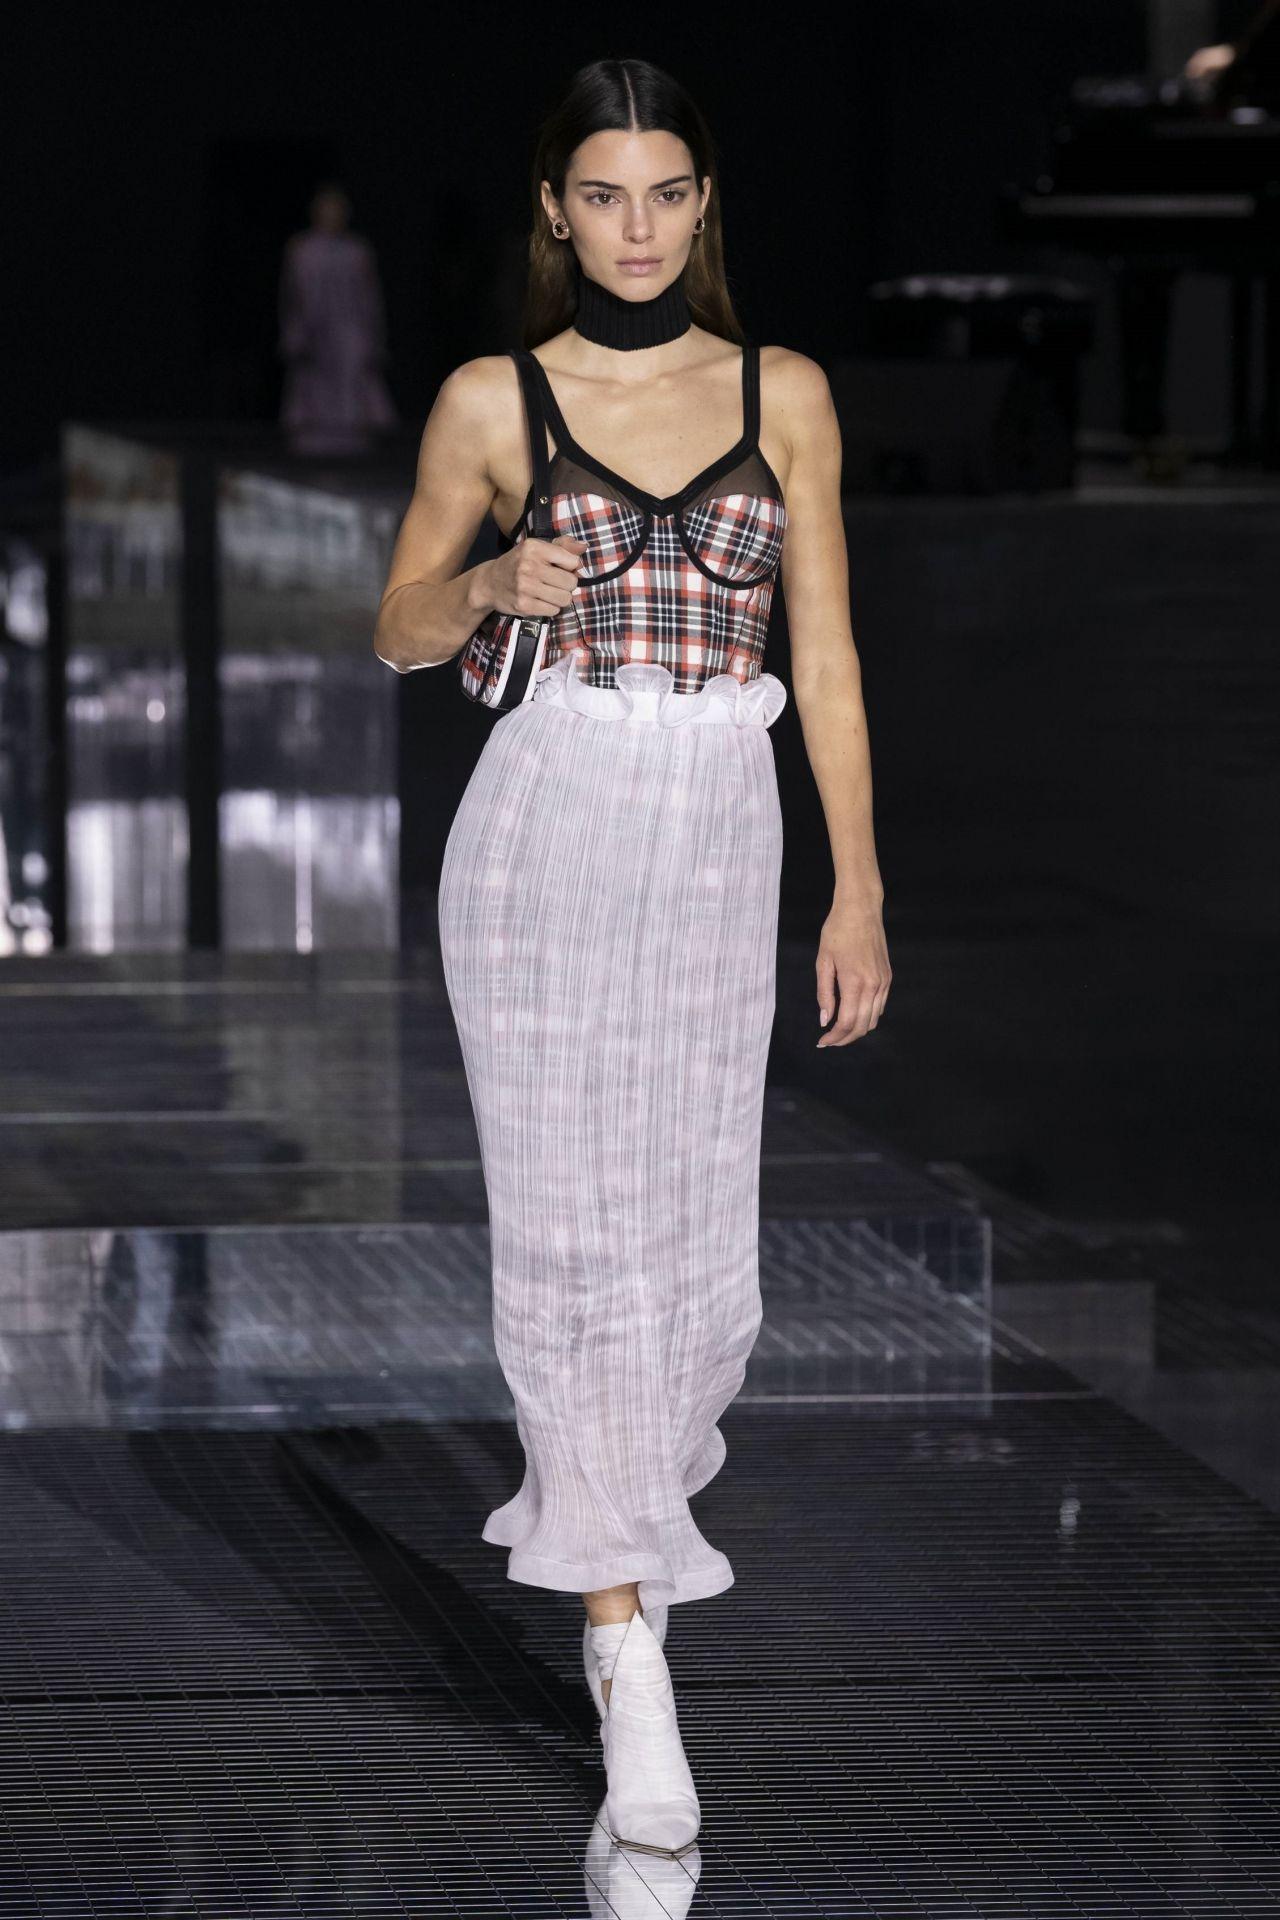 kendall-jenner-rocks-the-runway-burberry-aw20-london-fashion-week-show